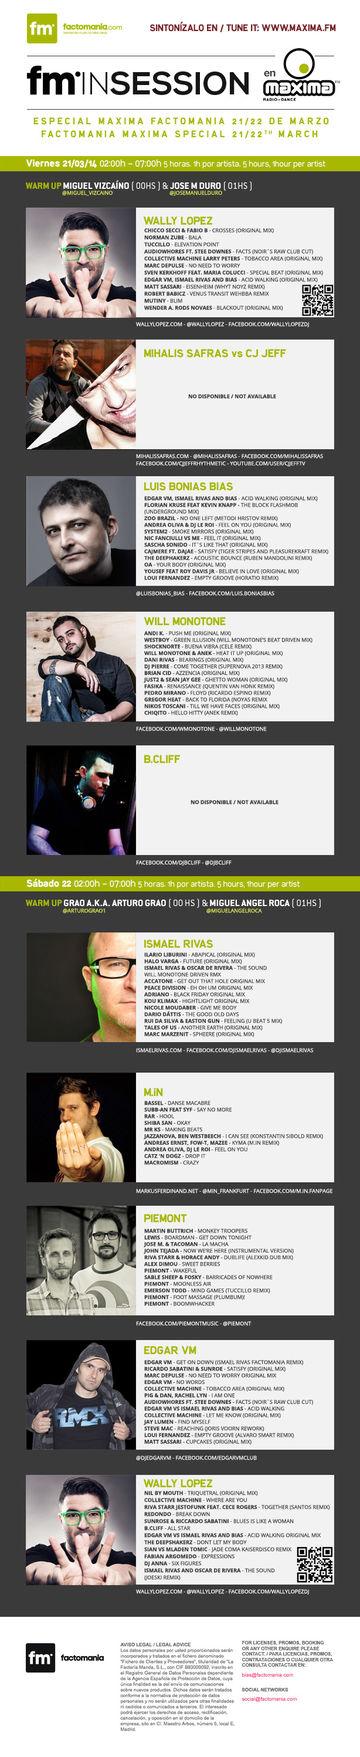 2014-03-2X - VA - Factomania Maxima Special (In Sessions, Maxima FM).jpg